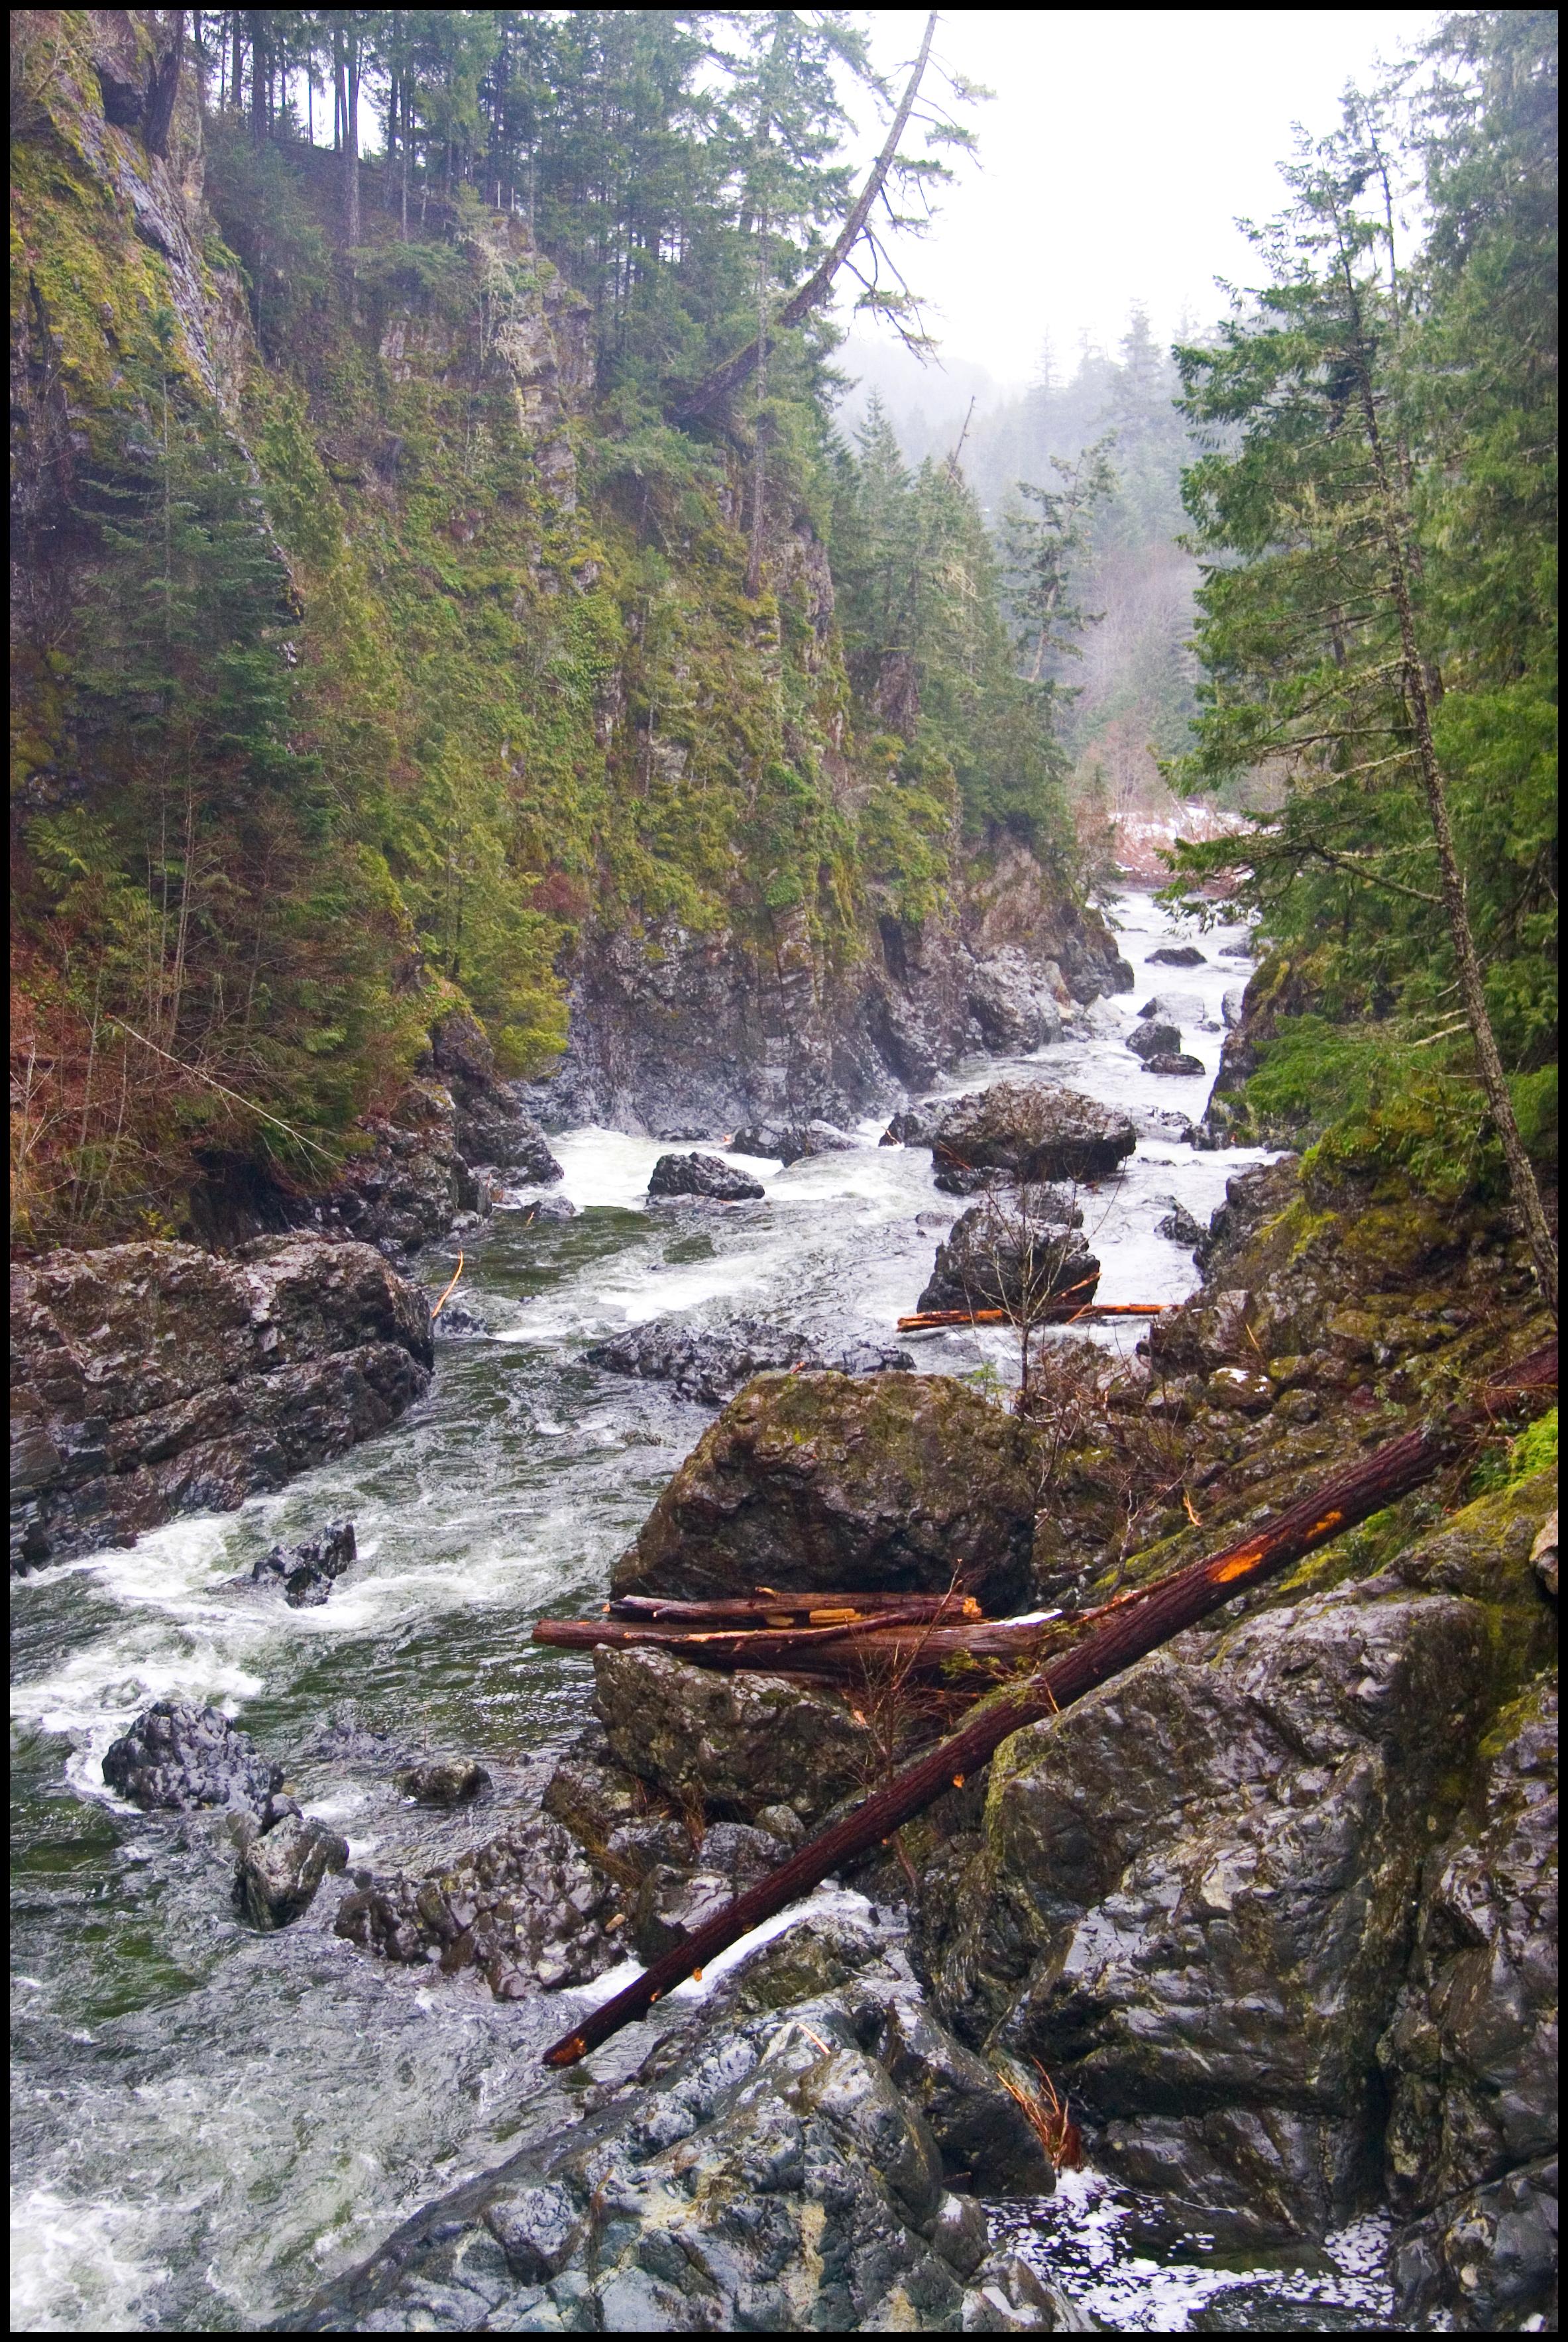 Sooke River, Vancouver Island, BC, Calypso Orchid攝